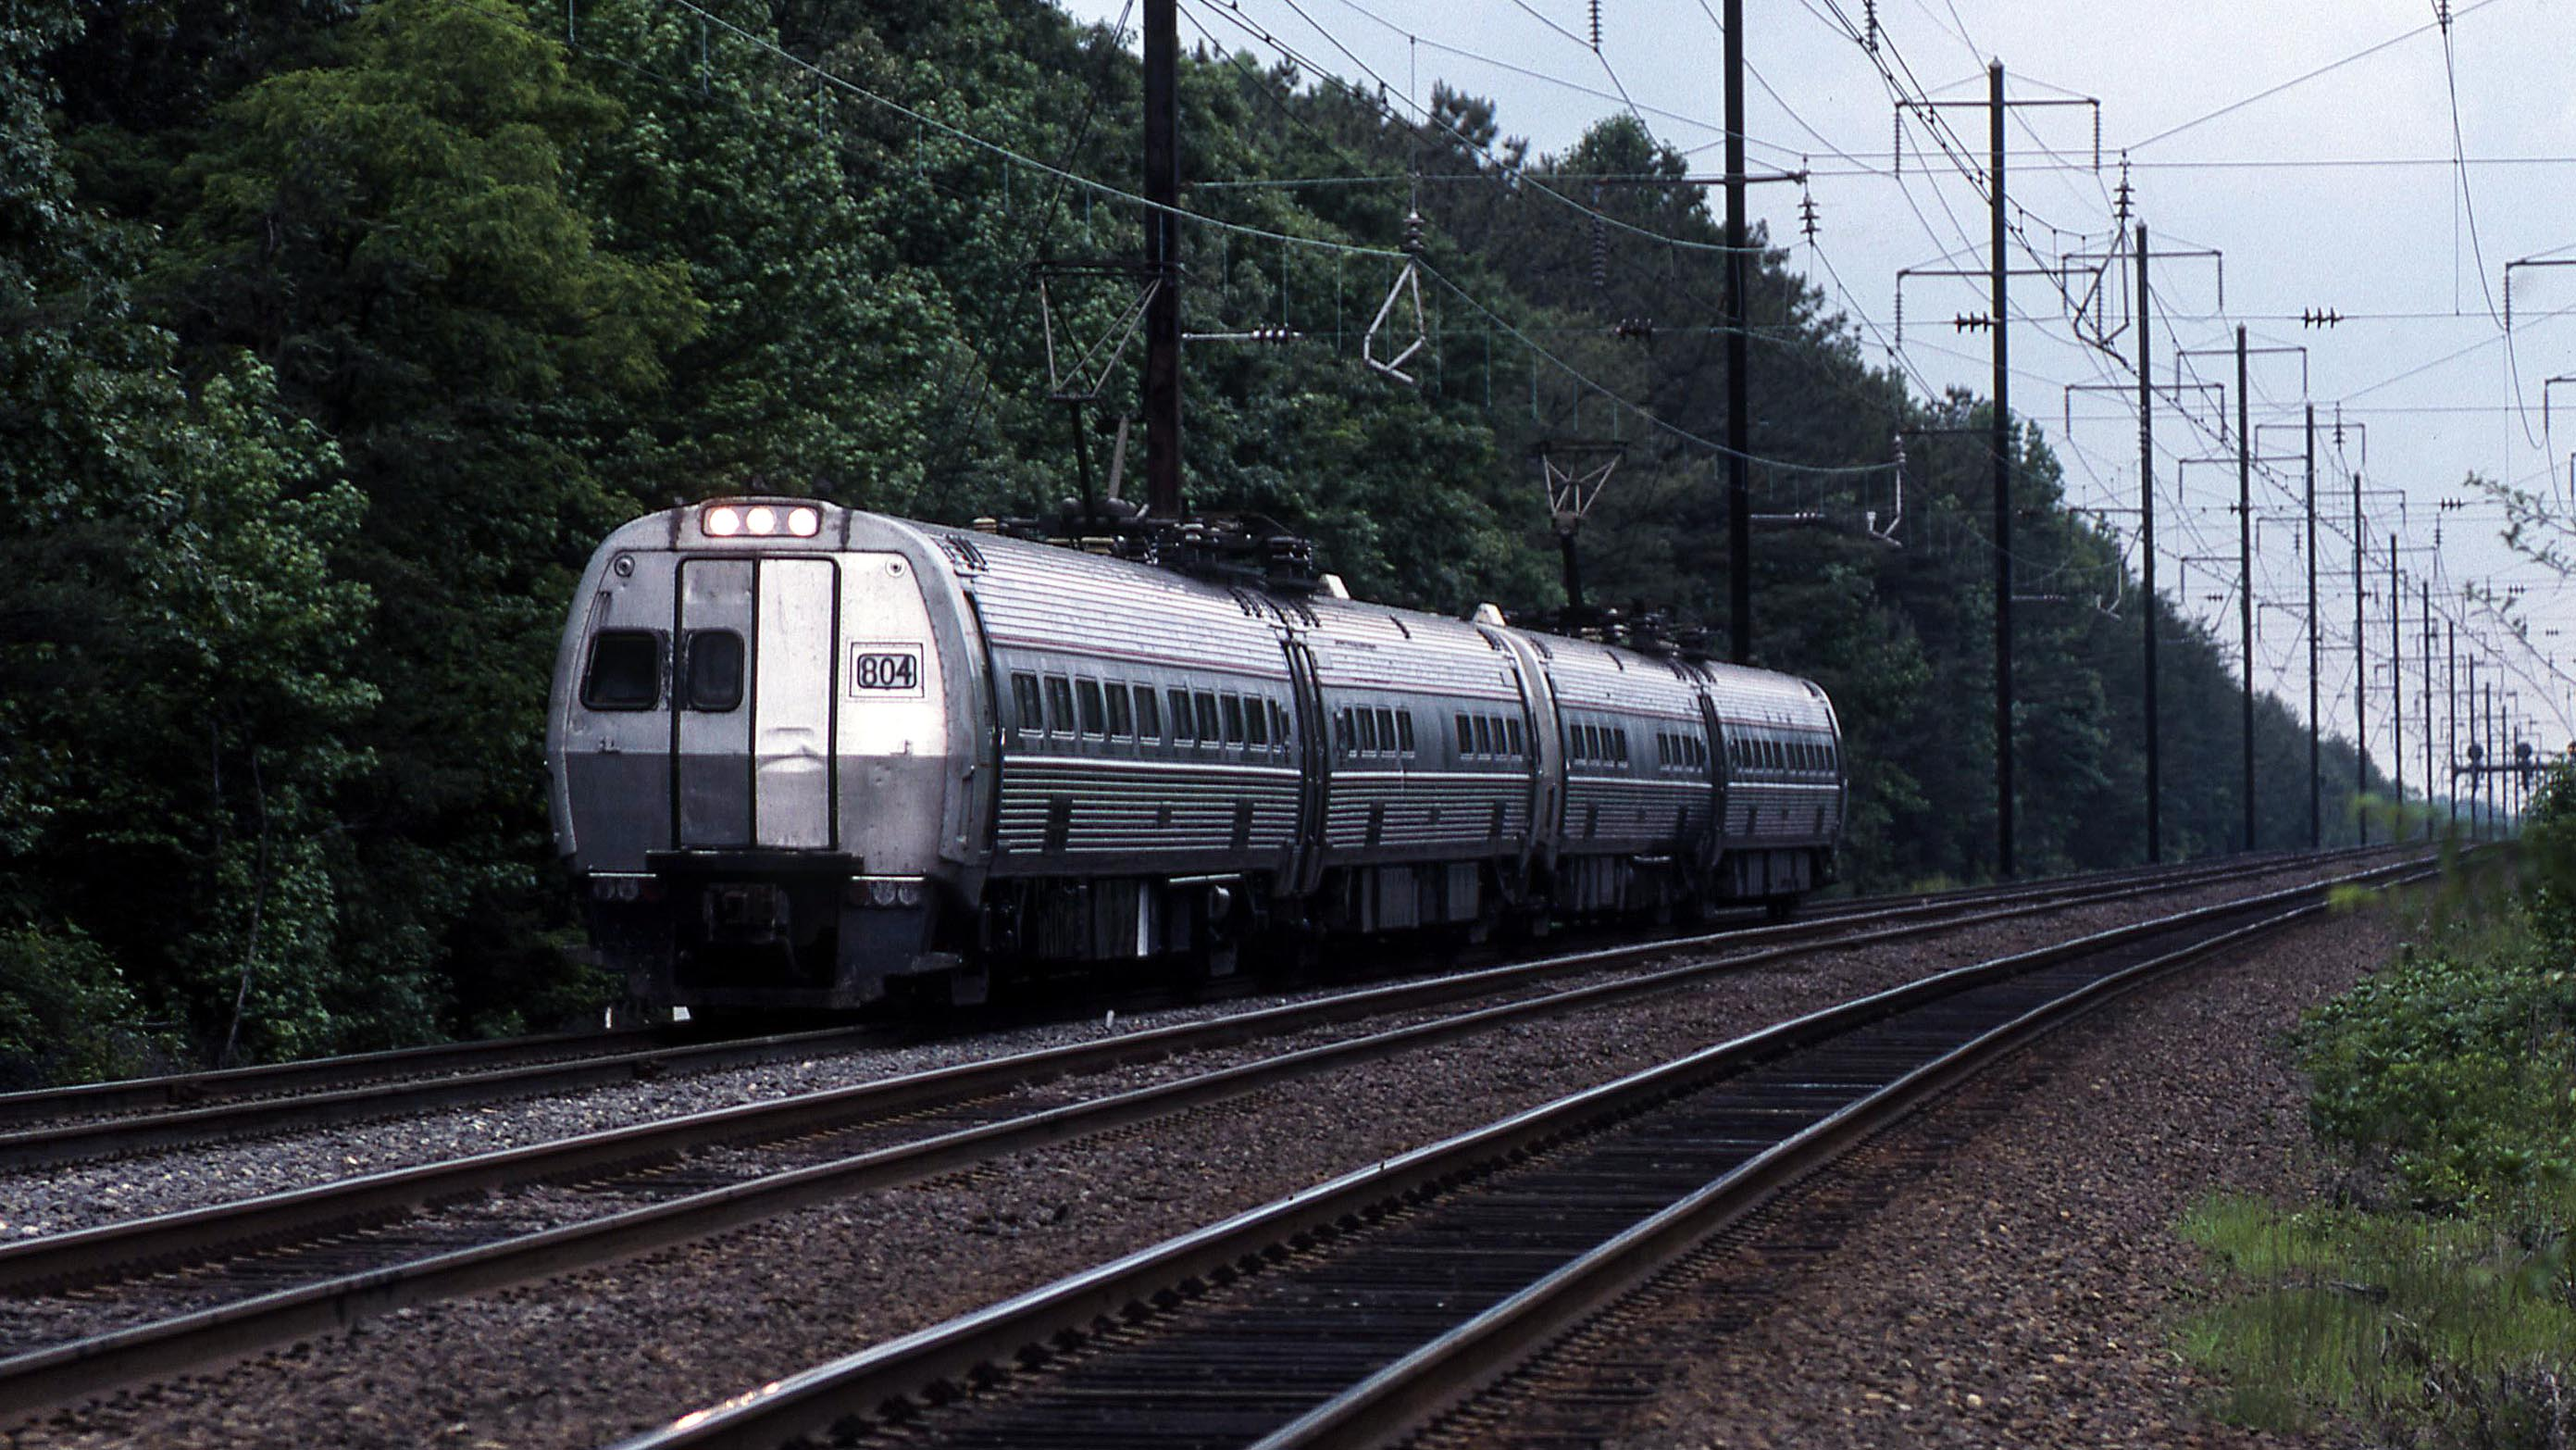 804-Bowie-Metroliner-Amtrak-Gary-Dolzall